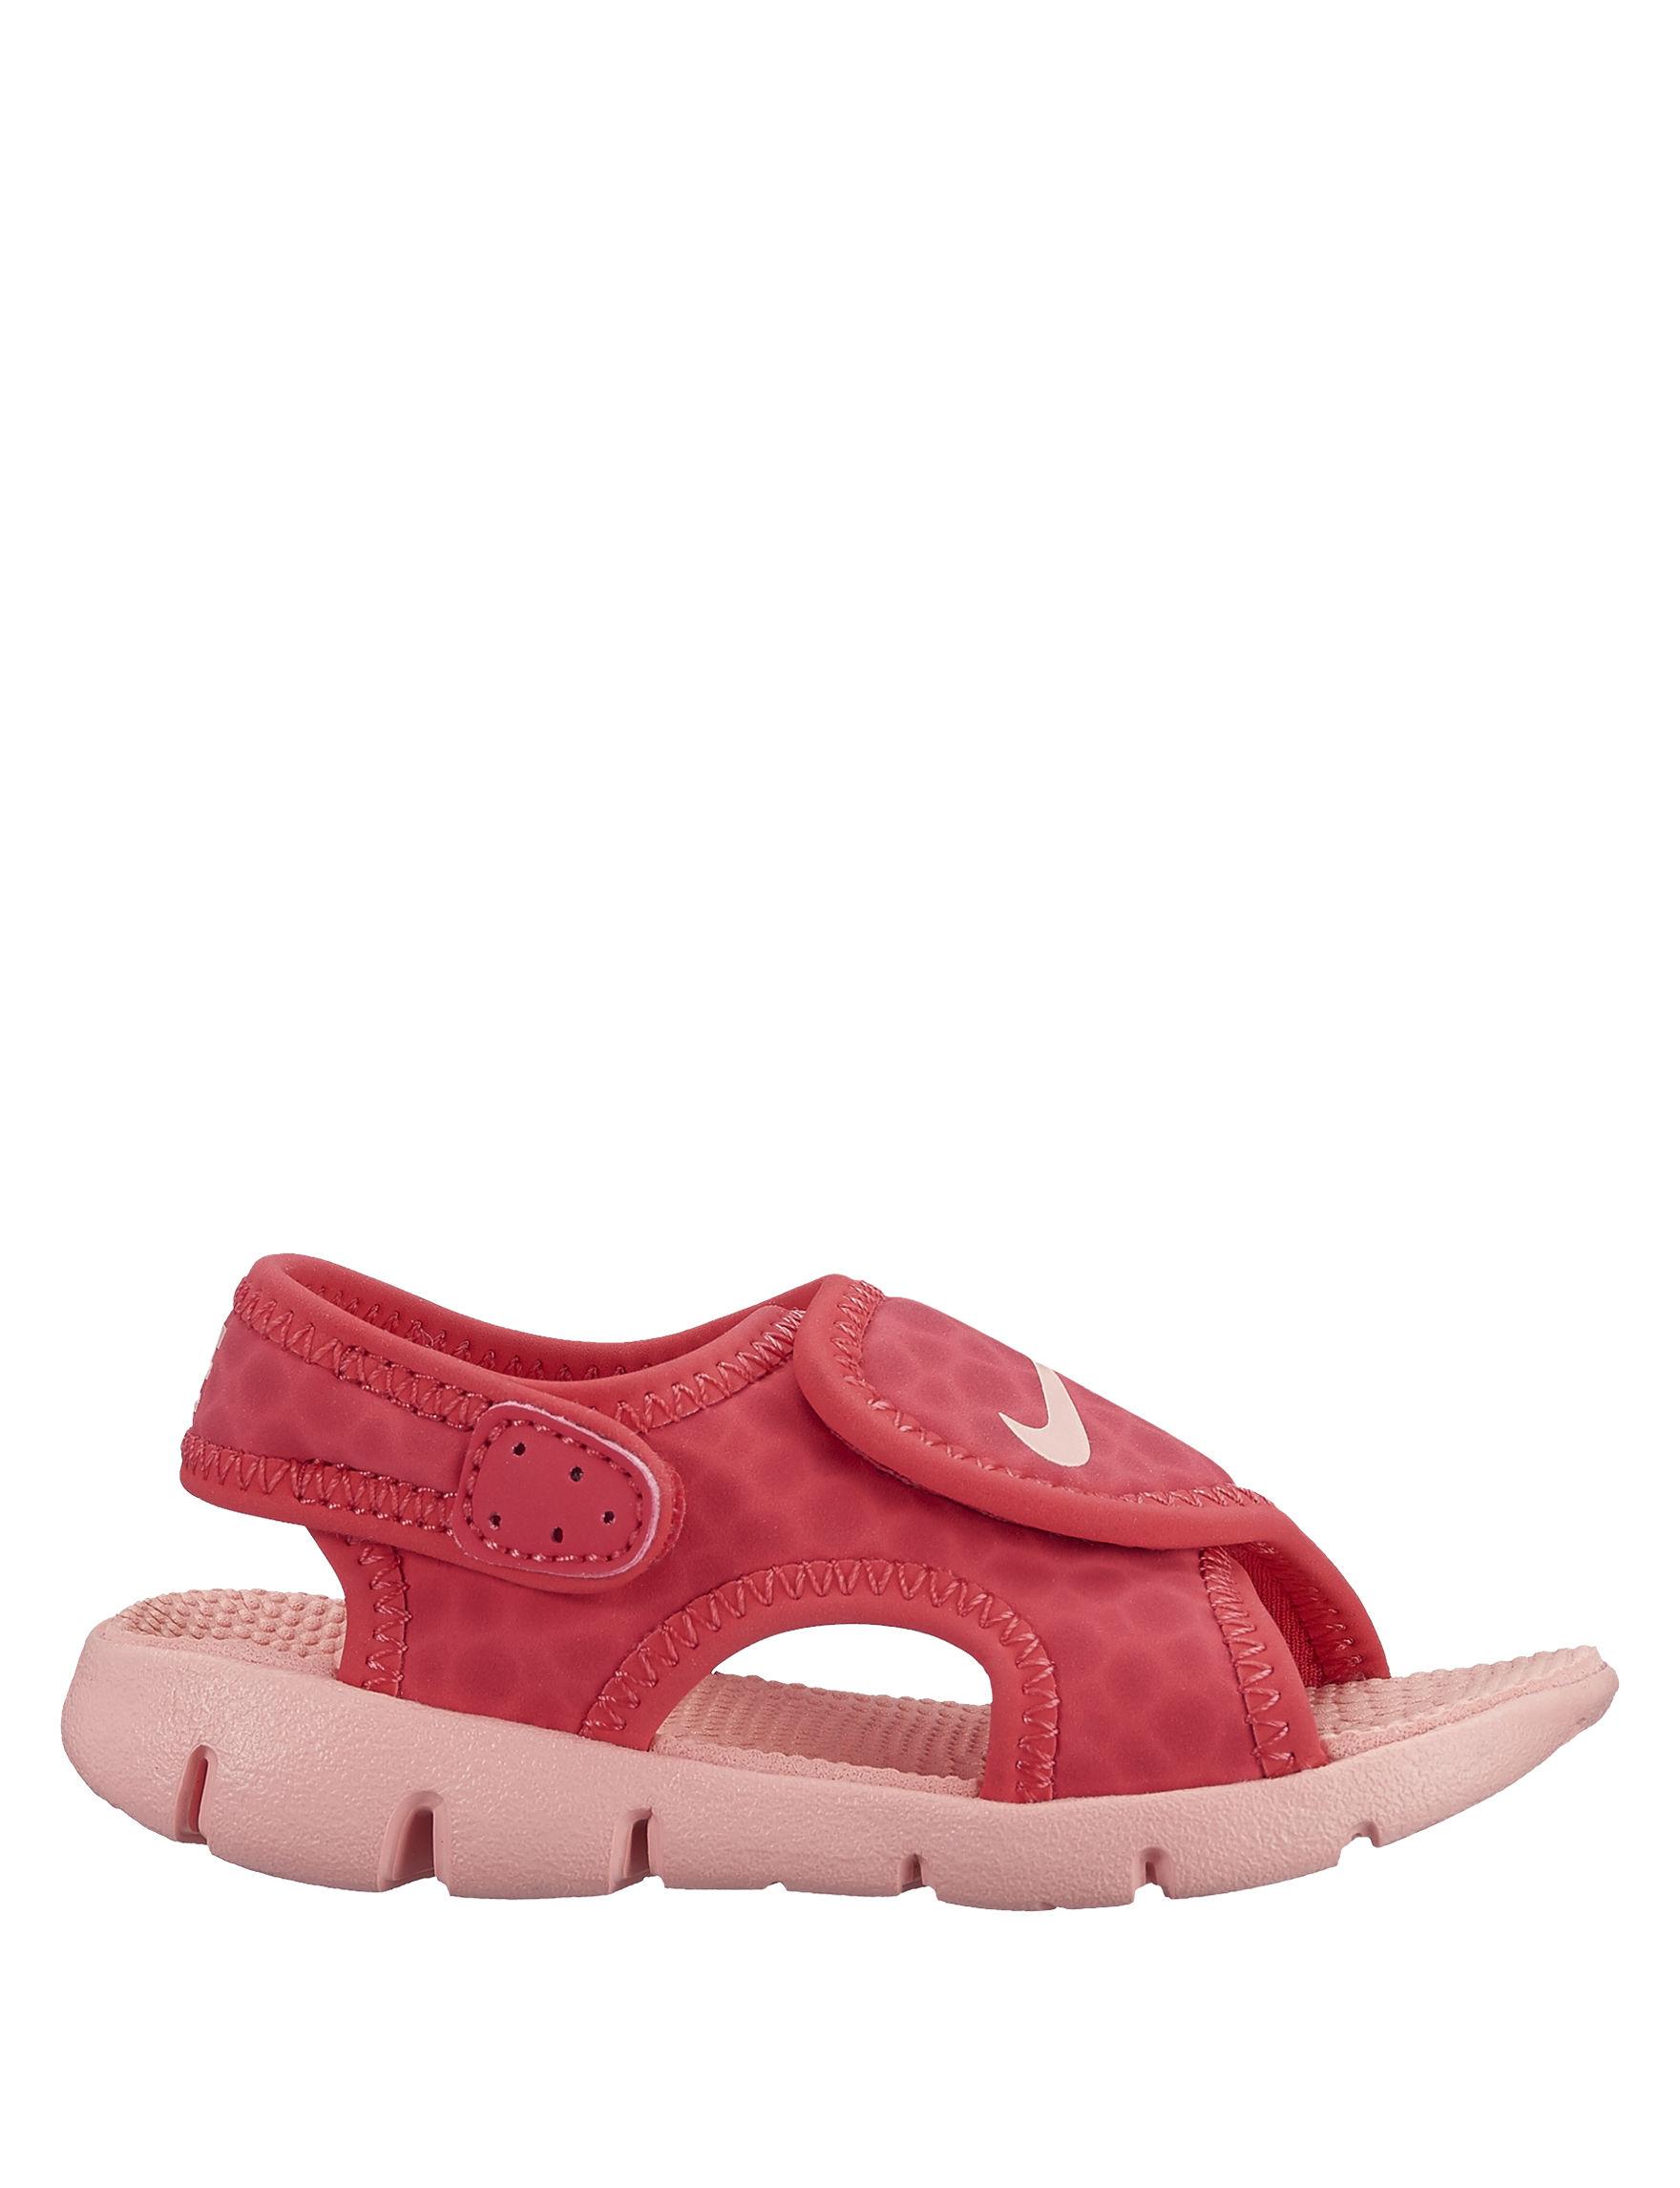 Nike Coral Flat Sandals